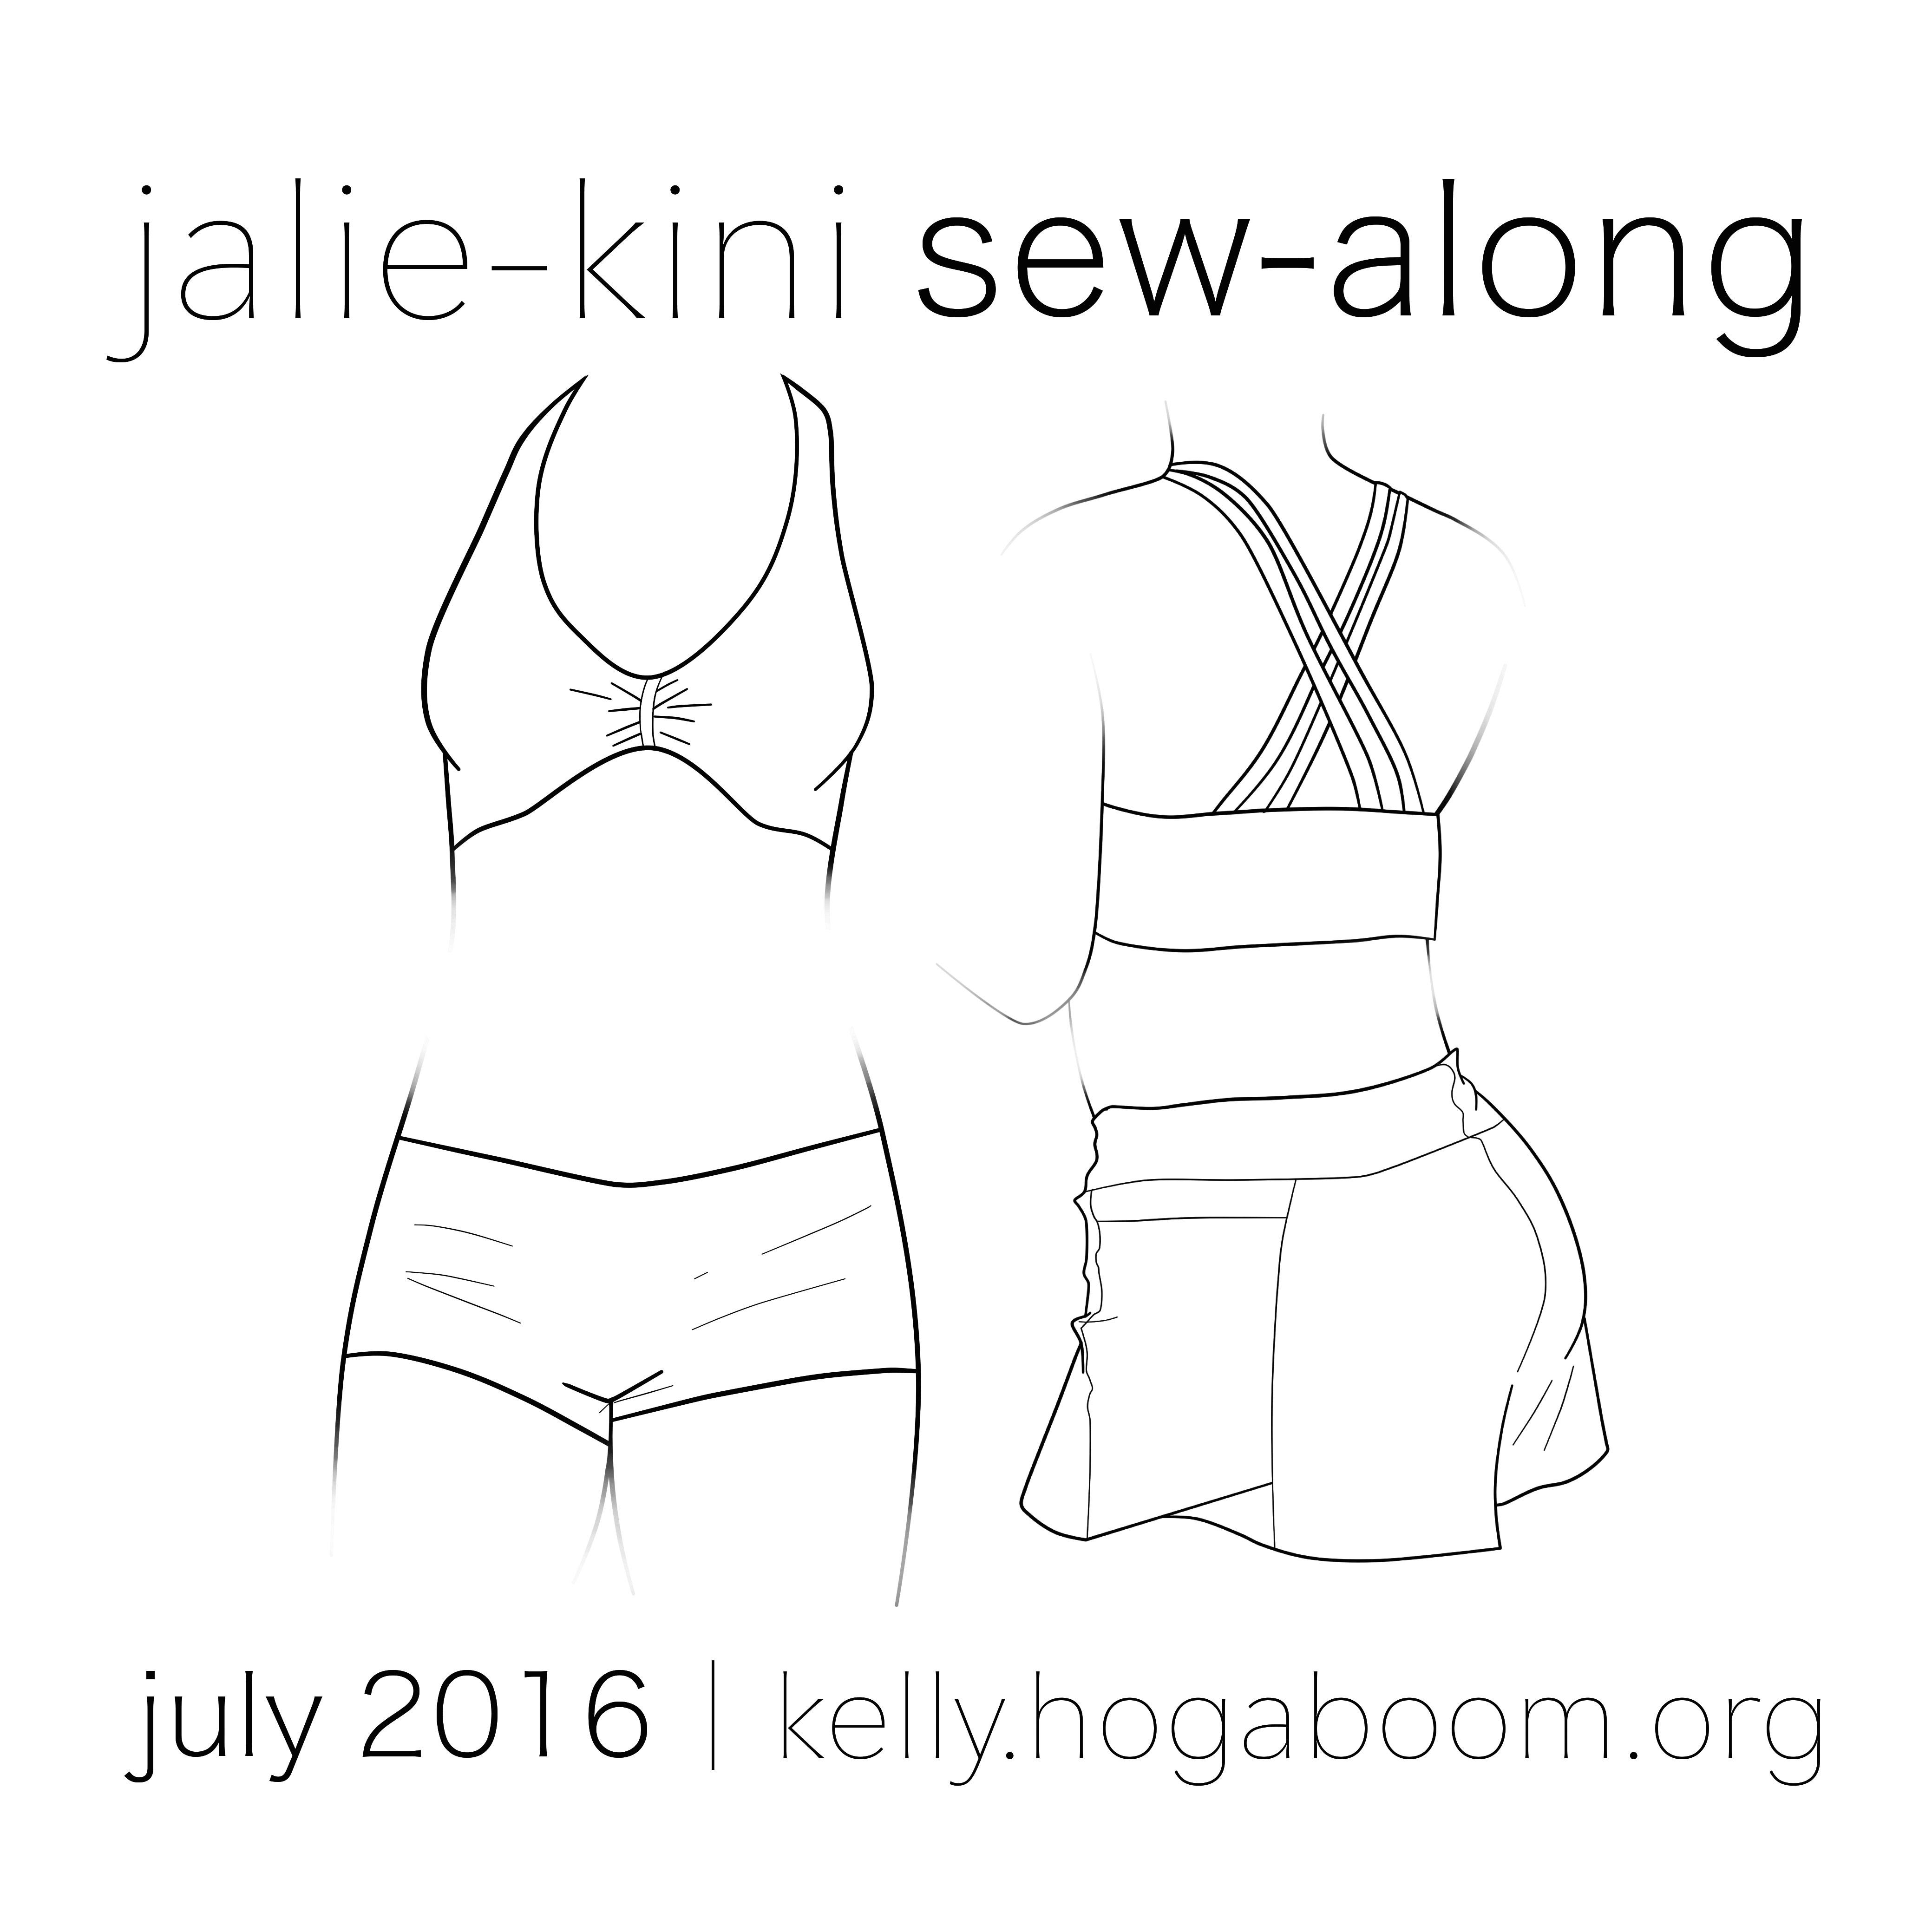 jalie-kini sew-along: supplies